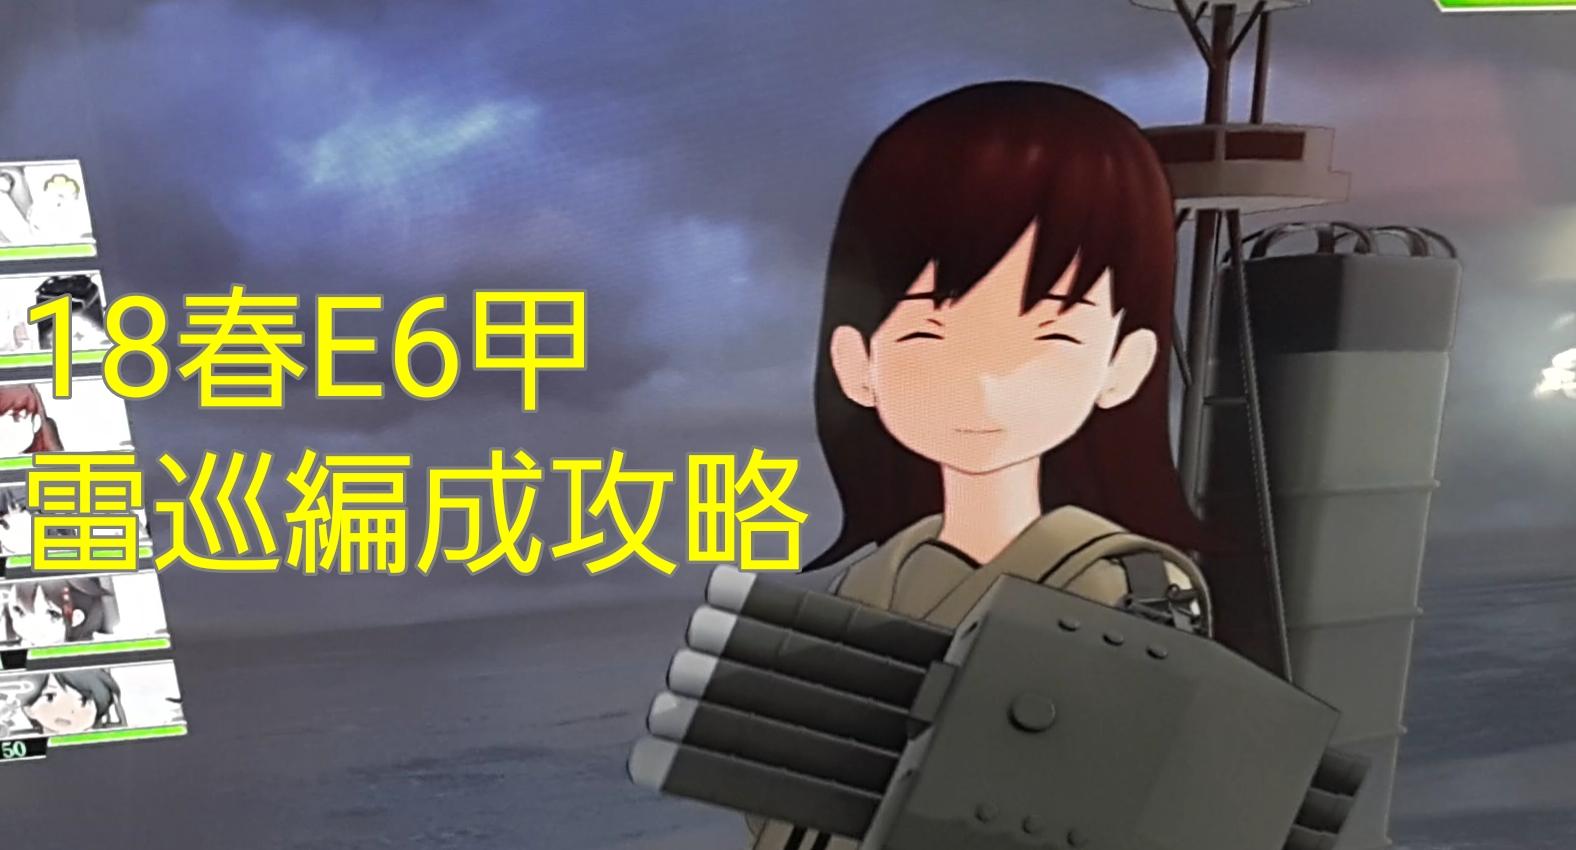 【AC】決戦!南方海域鉄底海峡(18春E6甲) 雷巡2駆逐3航巡1 プレイ動画